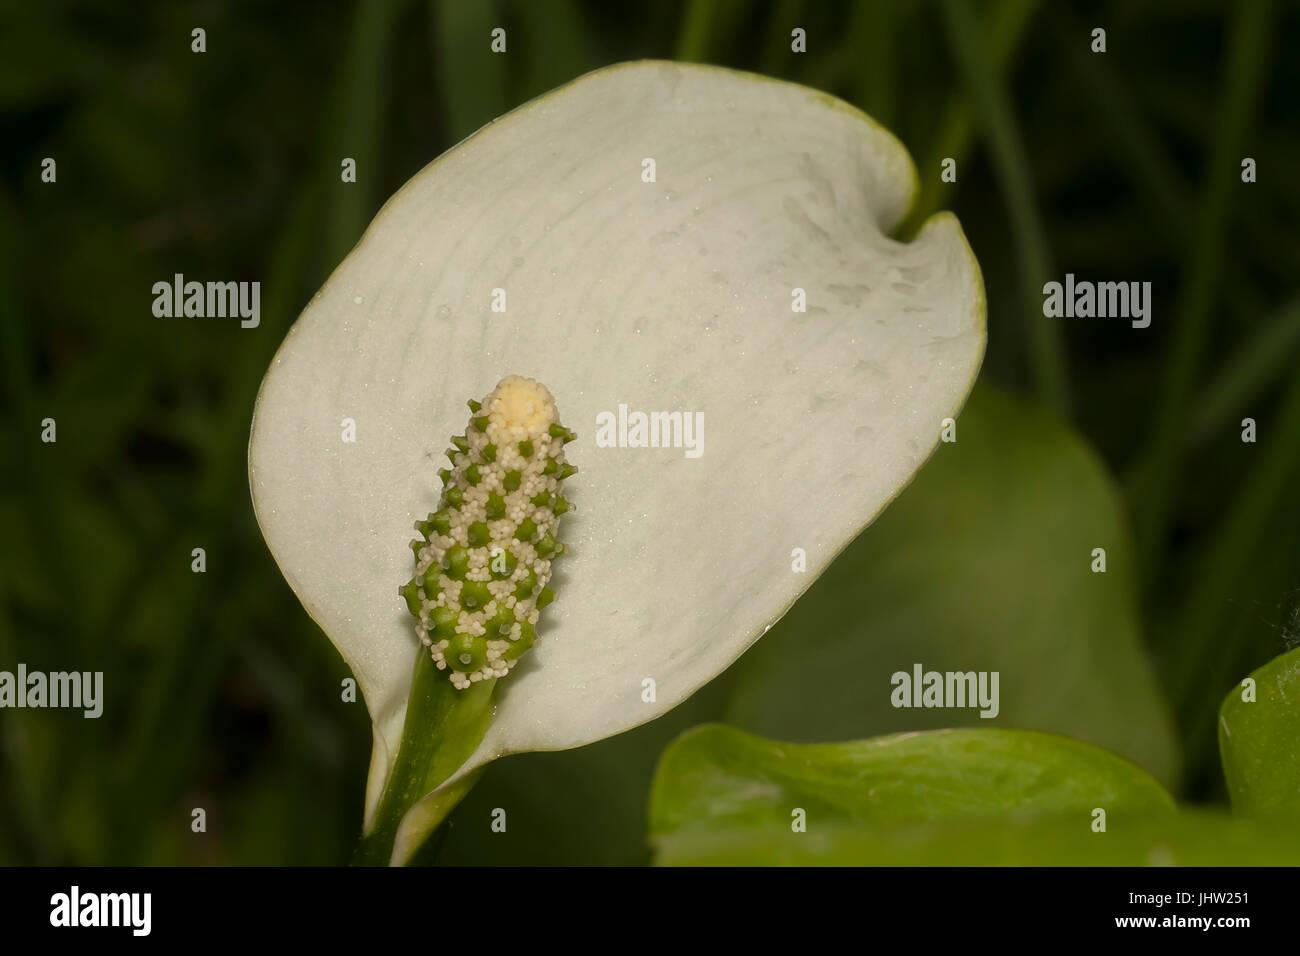 flower of calla palustris (bog arum) Stock Photo